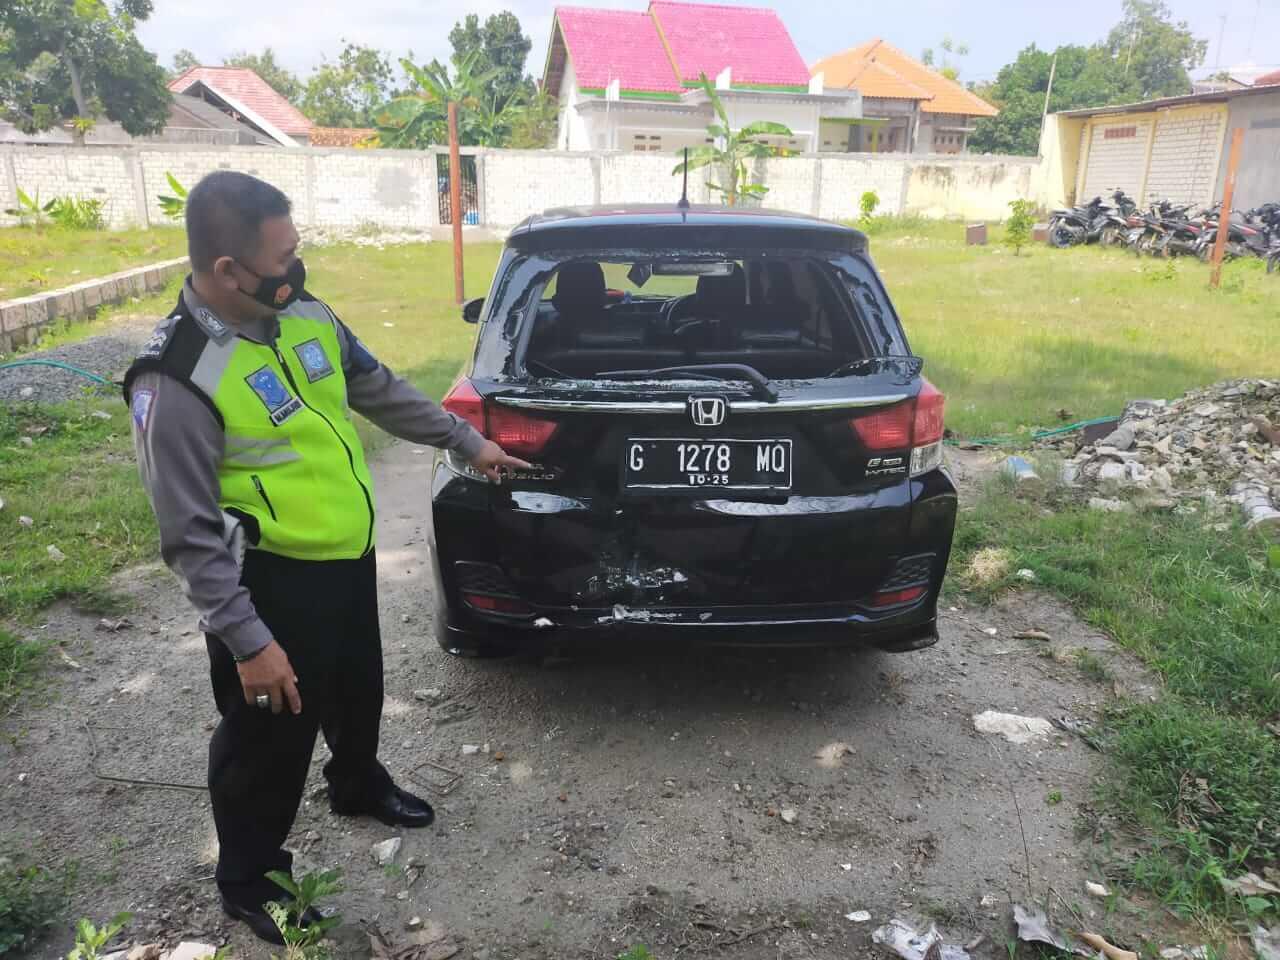 Petugas kepolisian tengah melakukan evakuasi mobil yang terlibat kecelakaan di Tuban, Senin (22/3/2021). (Foto: Humas Polres Tuban)